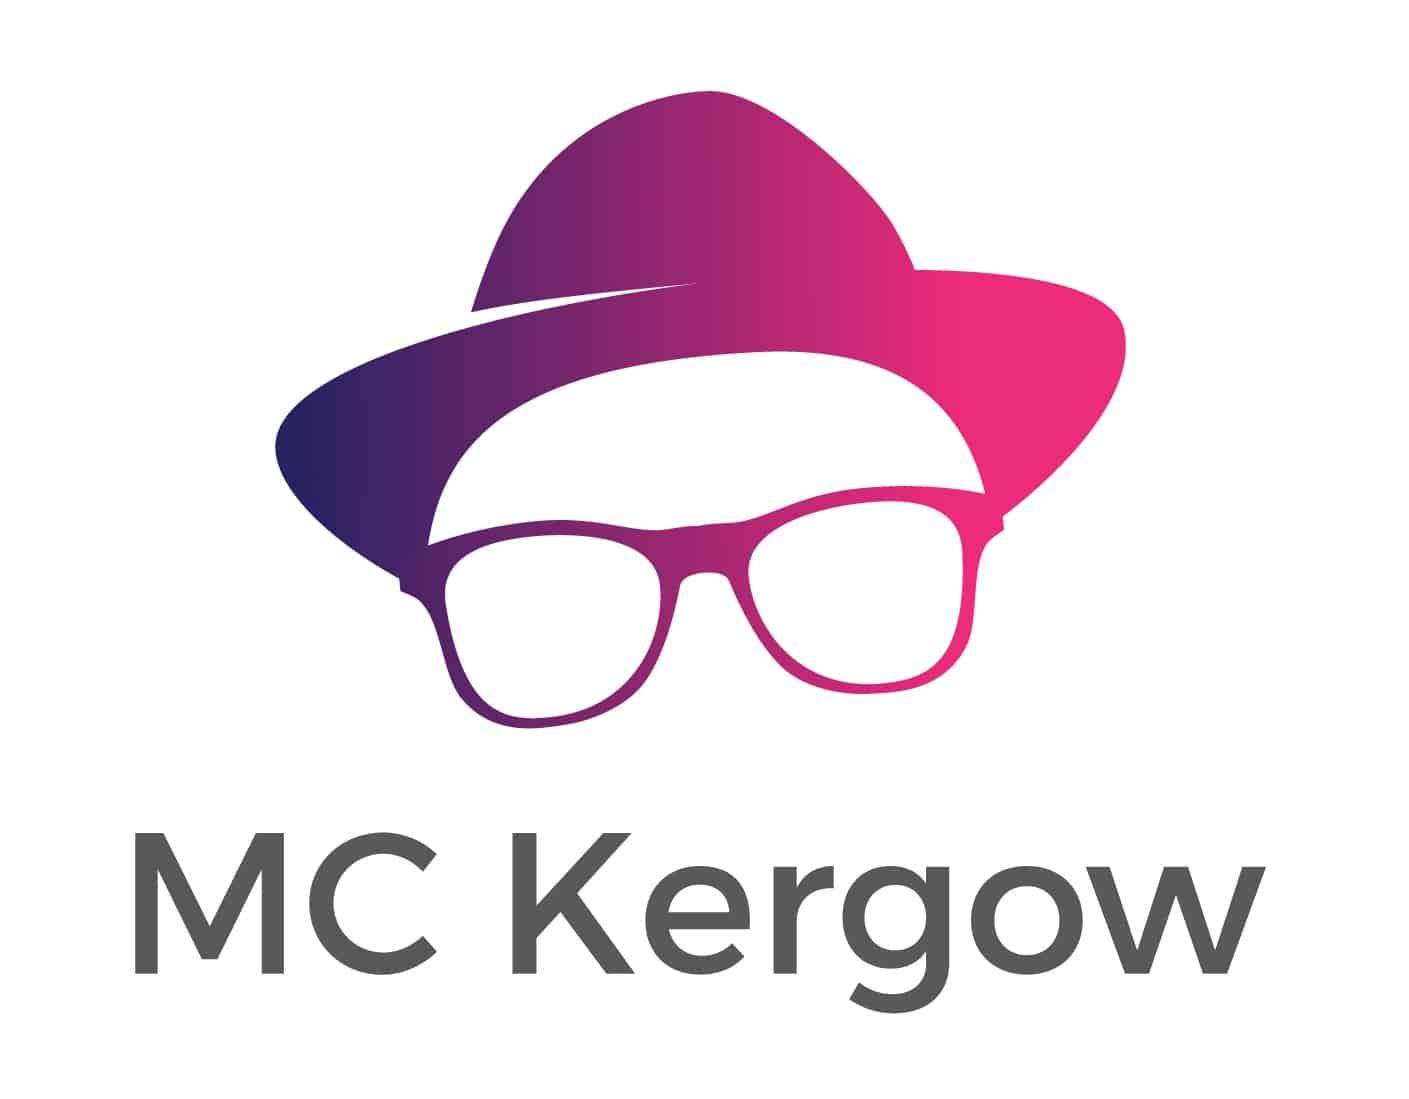 MC Kergow logo